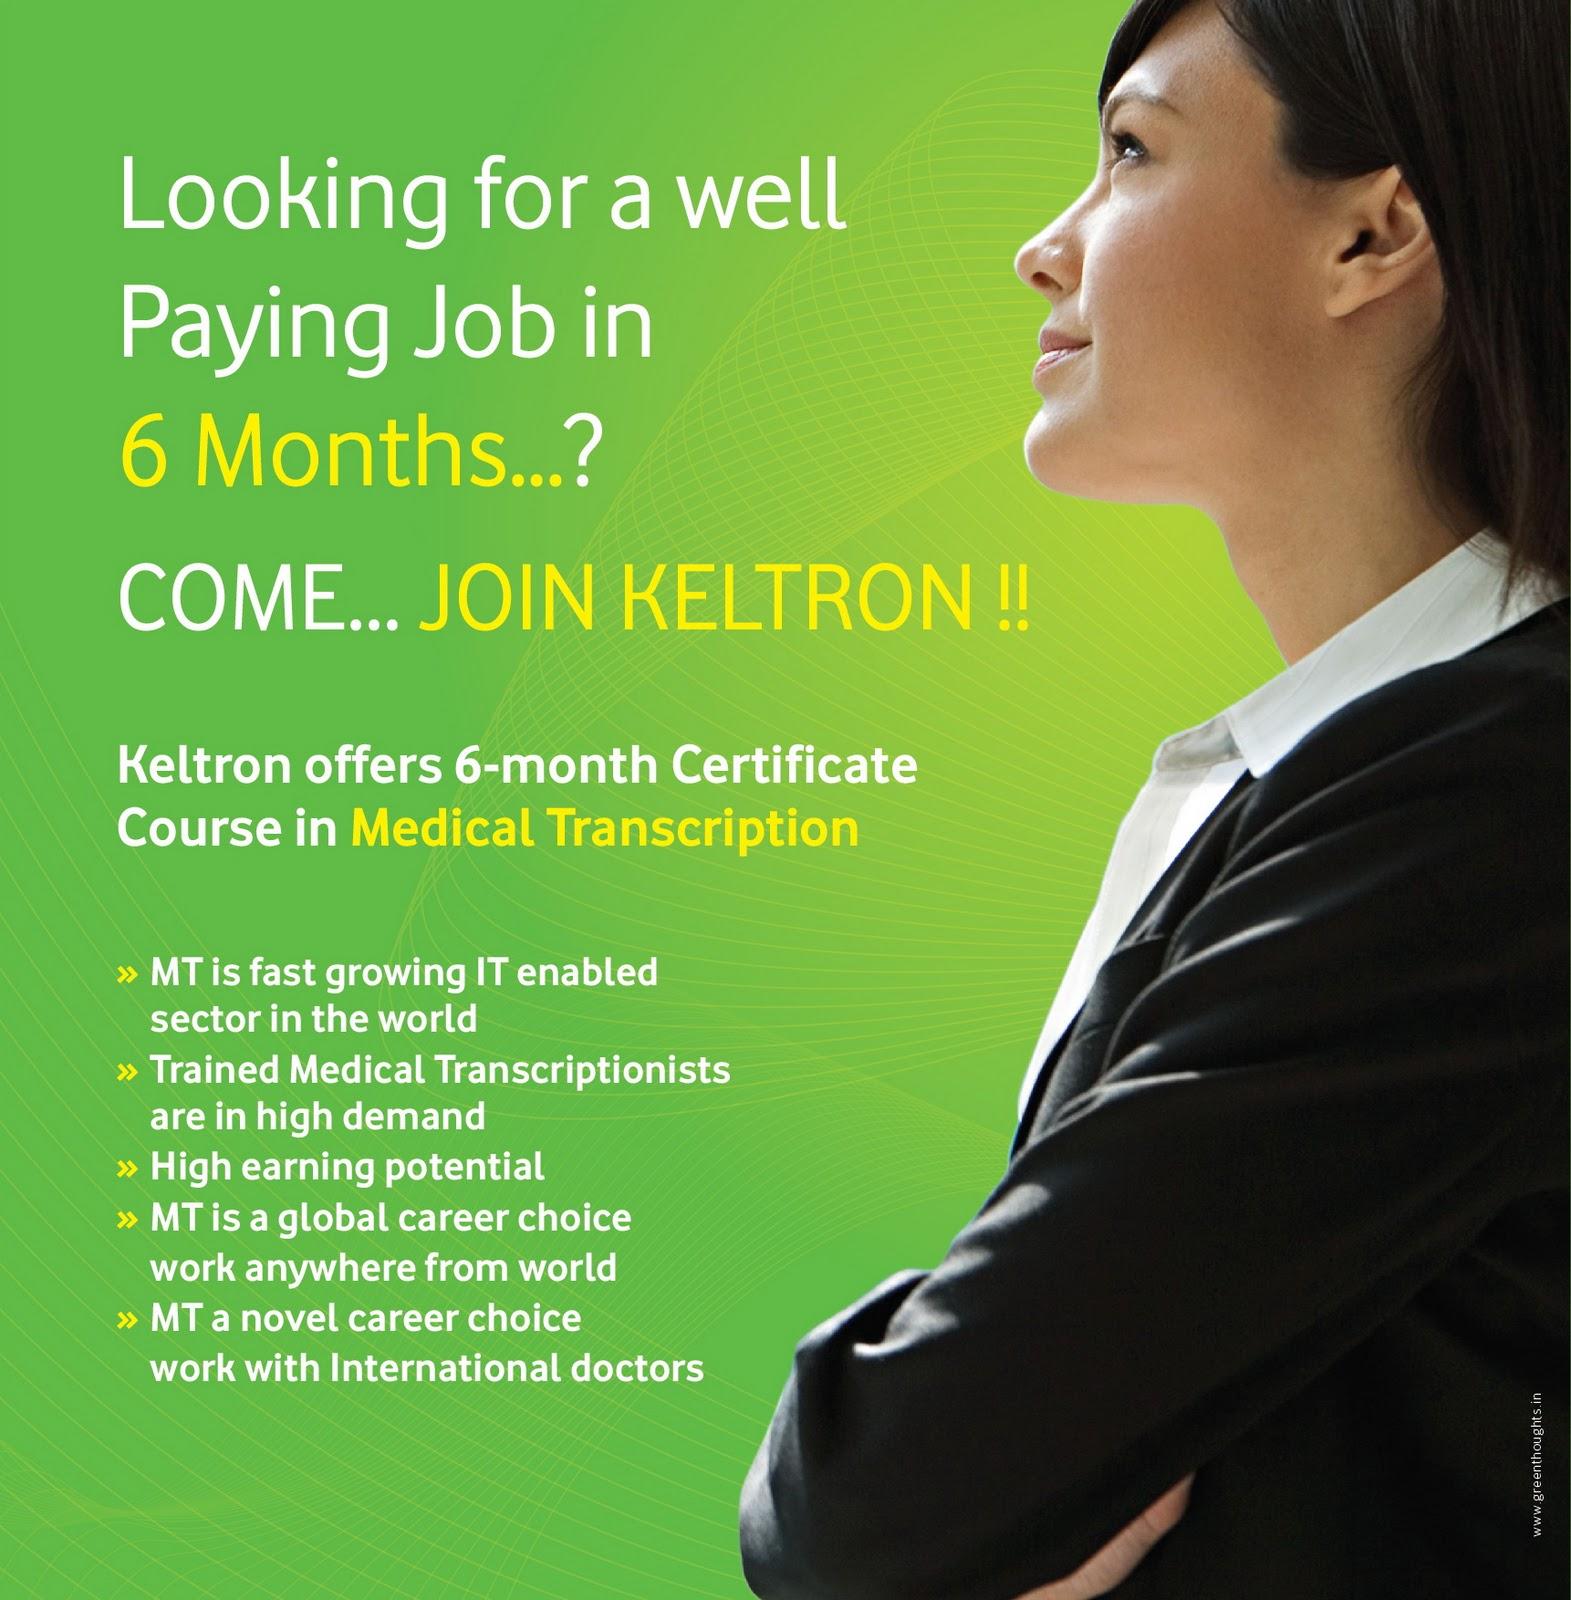 Govt keltron certified medical transcription training mt curriculum mt curriculum xflitez Image collections